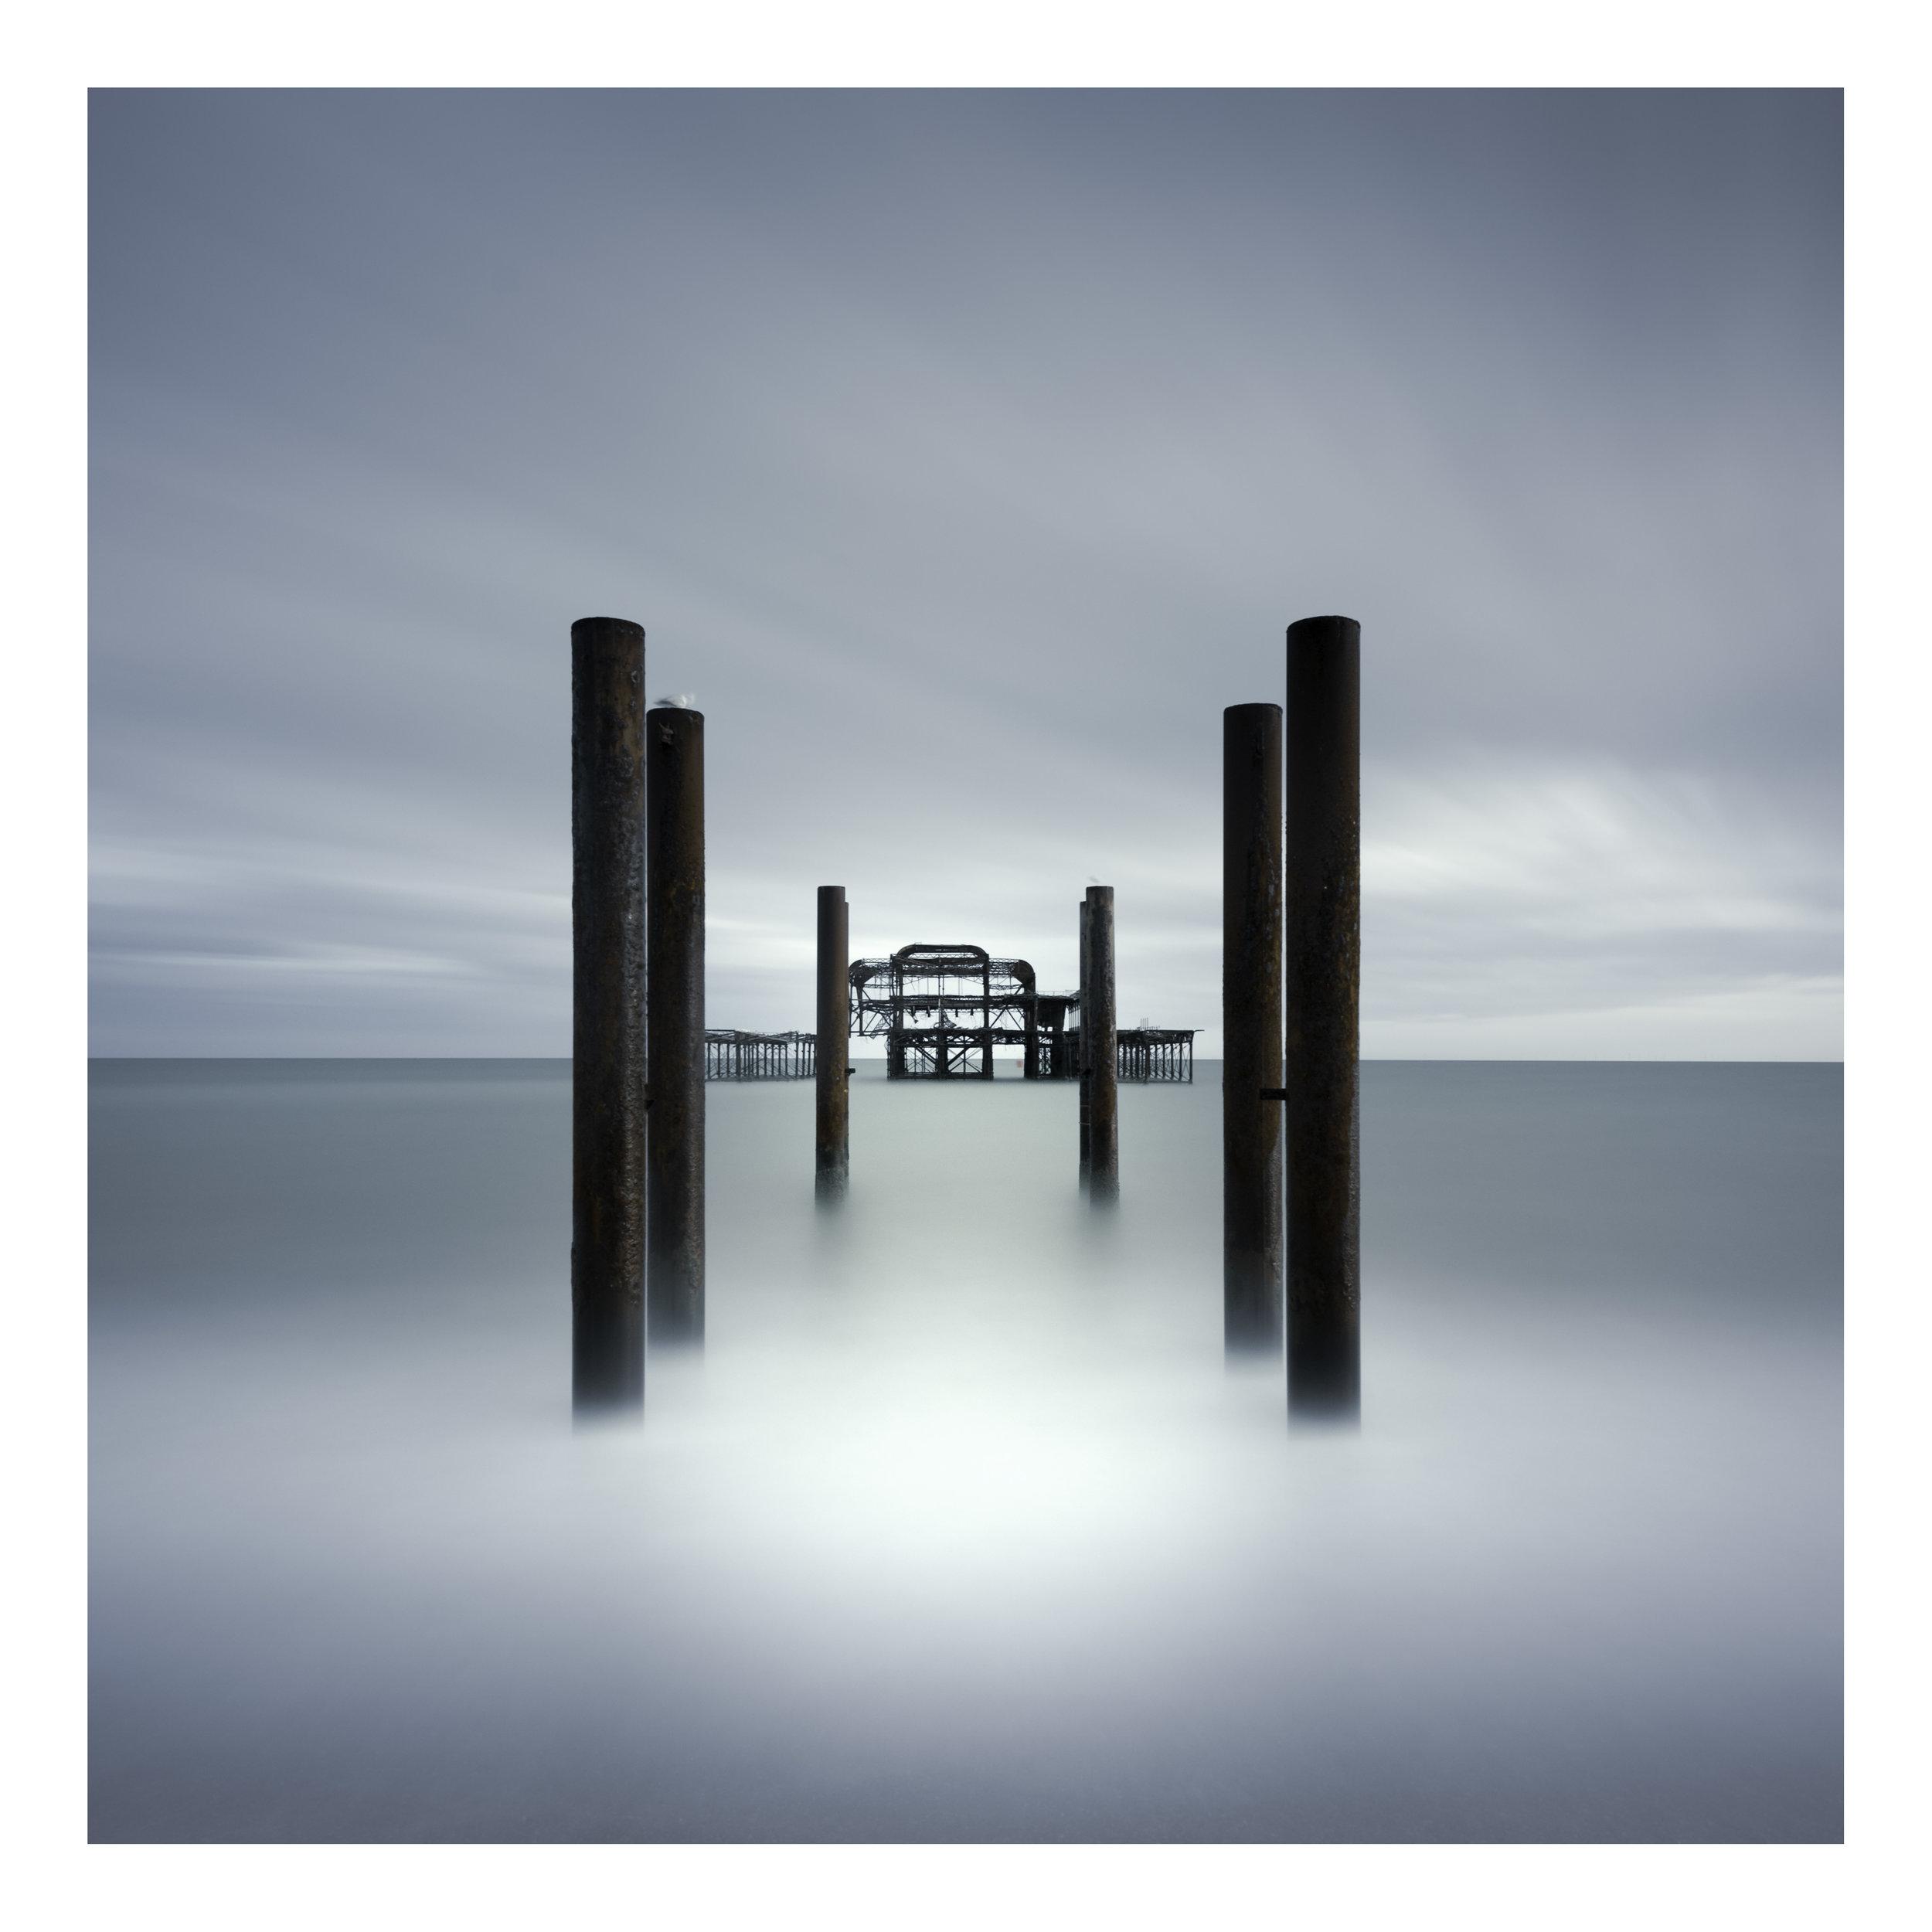 _ALI5658 brighton west pier from front.jpg